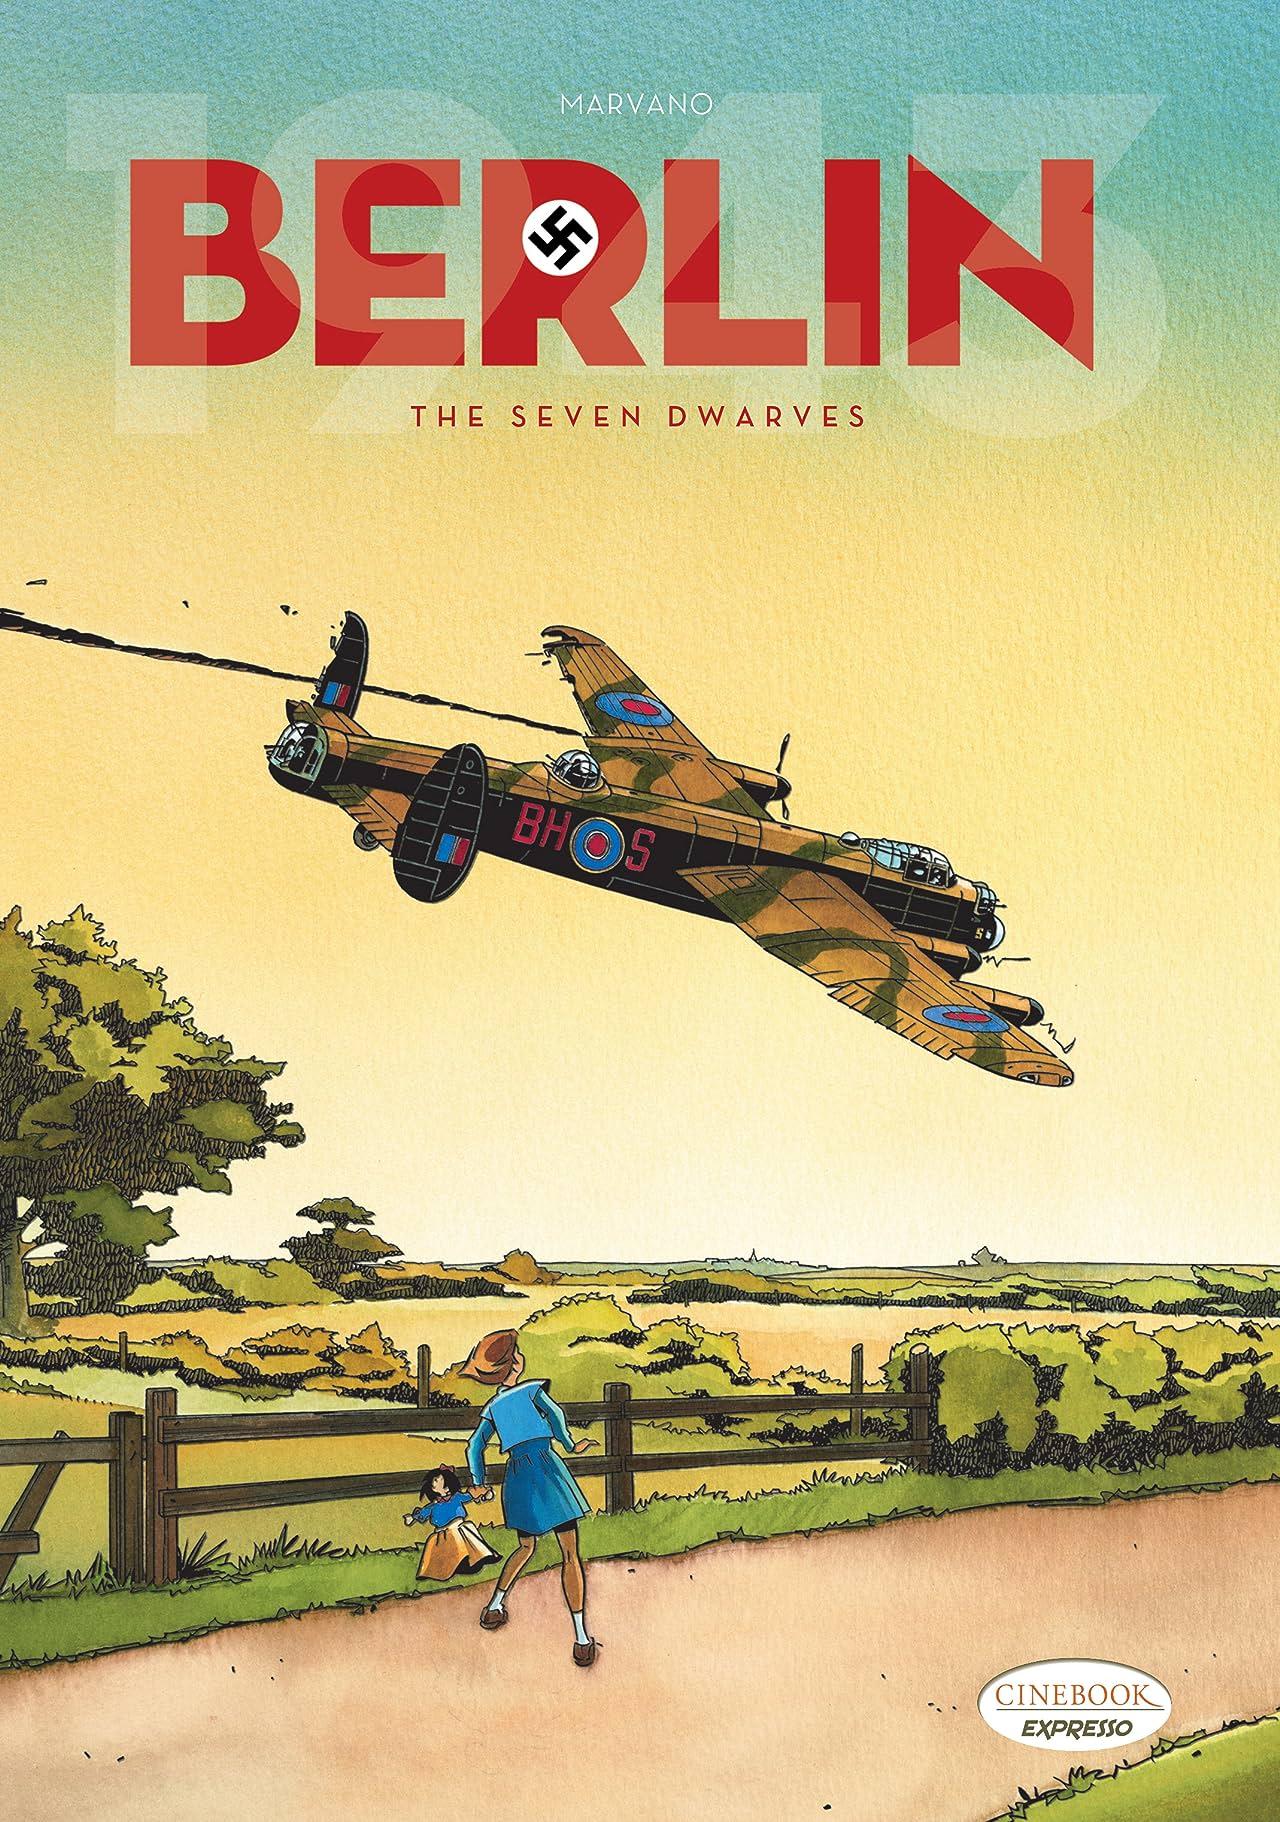 Berlin Vol. 1: The seven dwarves